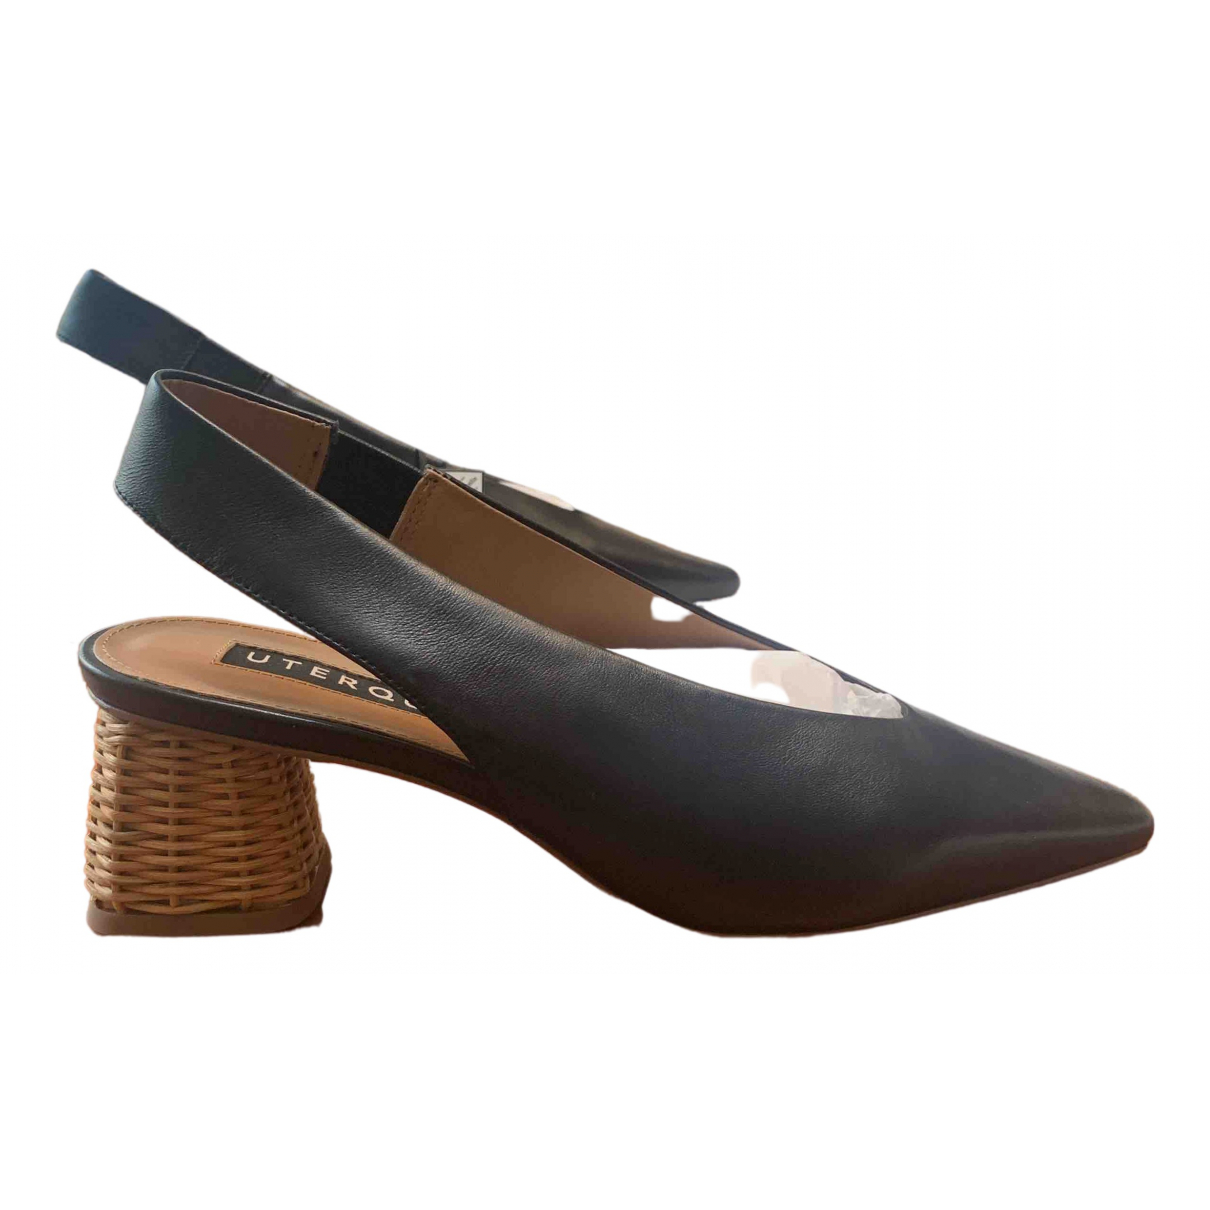 Uterque \N Black Leather Heels for Women 41 EU